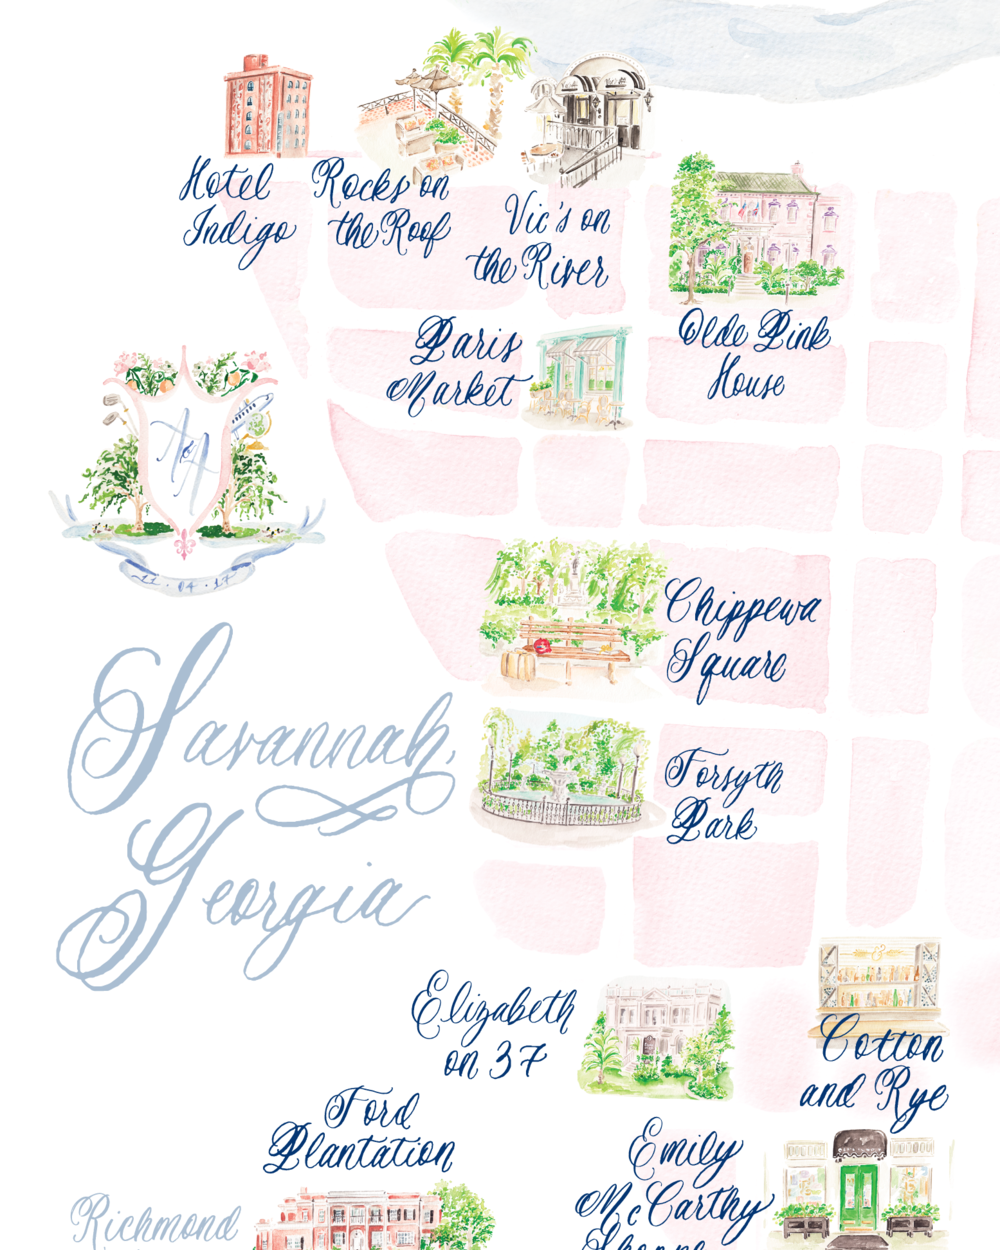 Ashley-Rapson-Wedding-Map.png